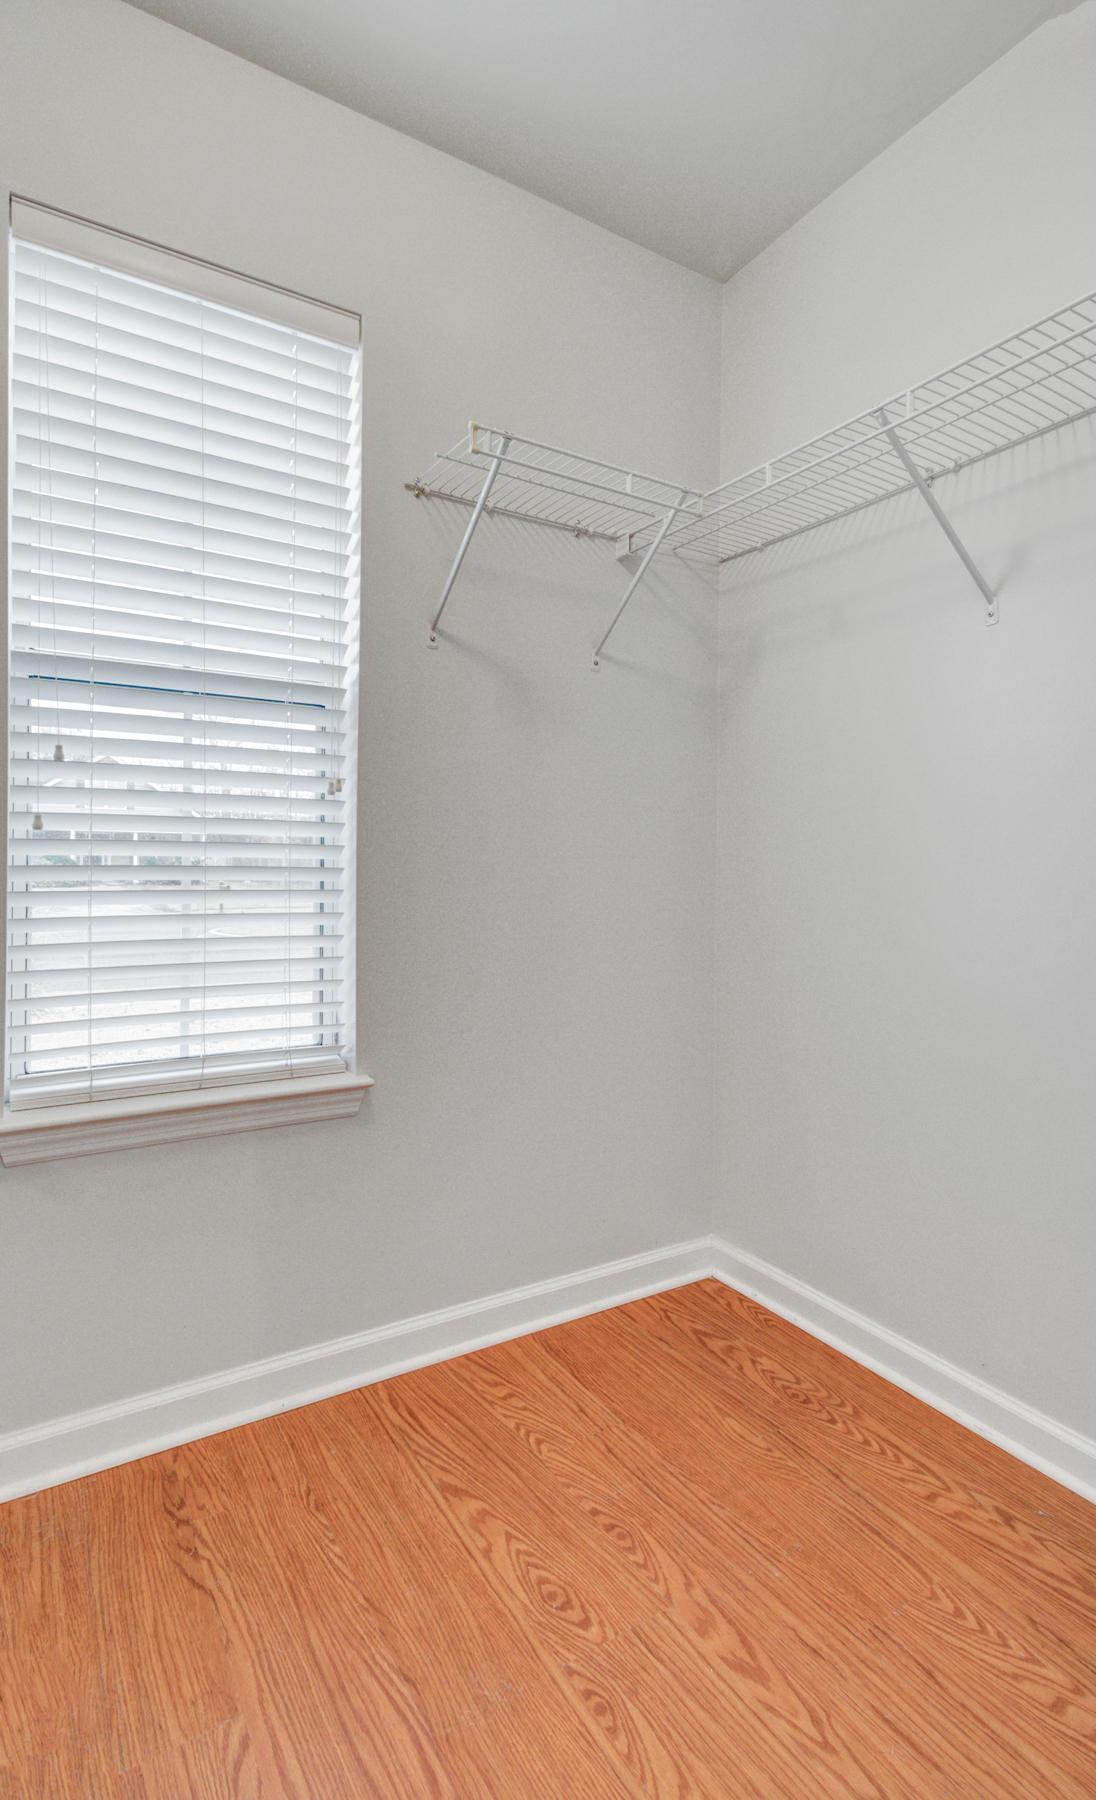 Grand Oaks Plantation Homes For Sale - 564 Hainesworth, Charleston, SC - 1